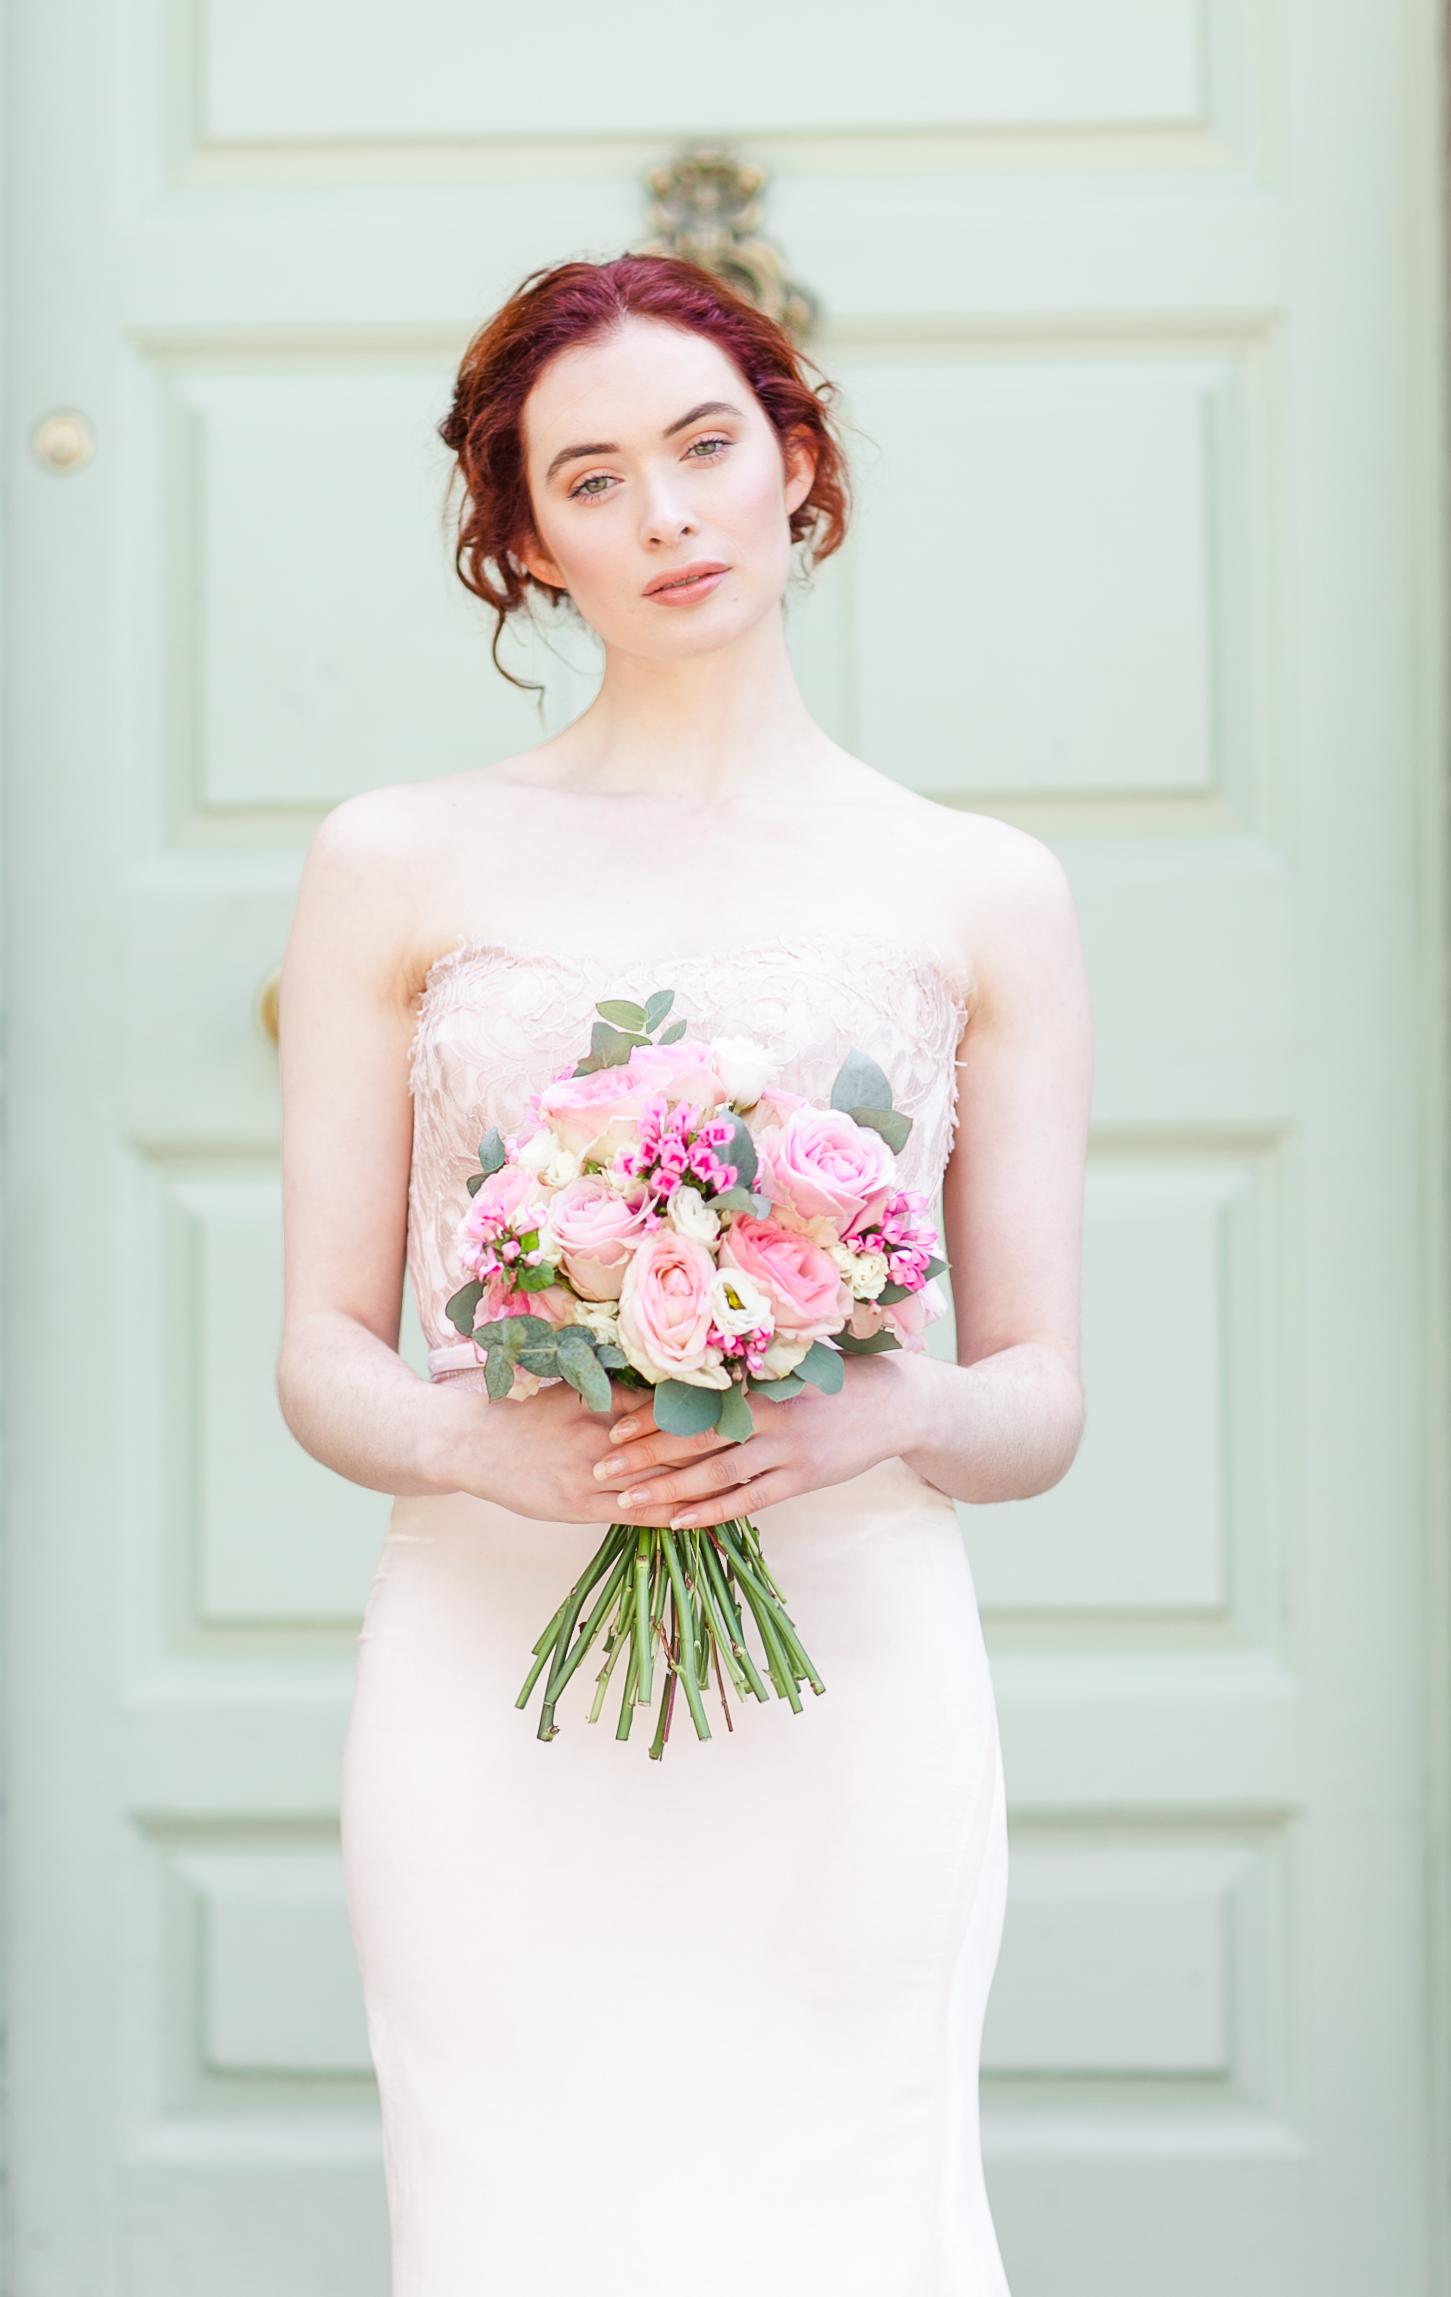 Bridal Shoot The Millhouse | Wedding Inspiration